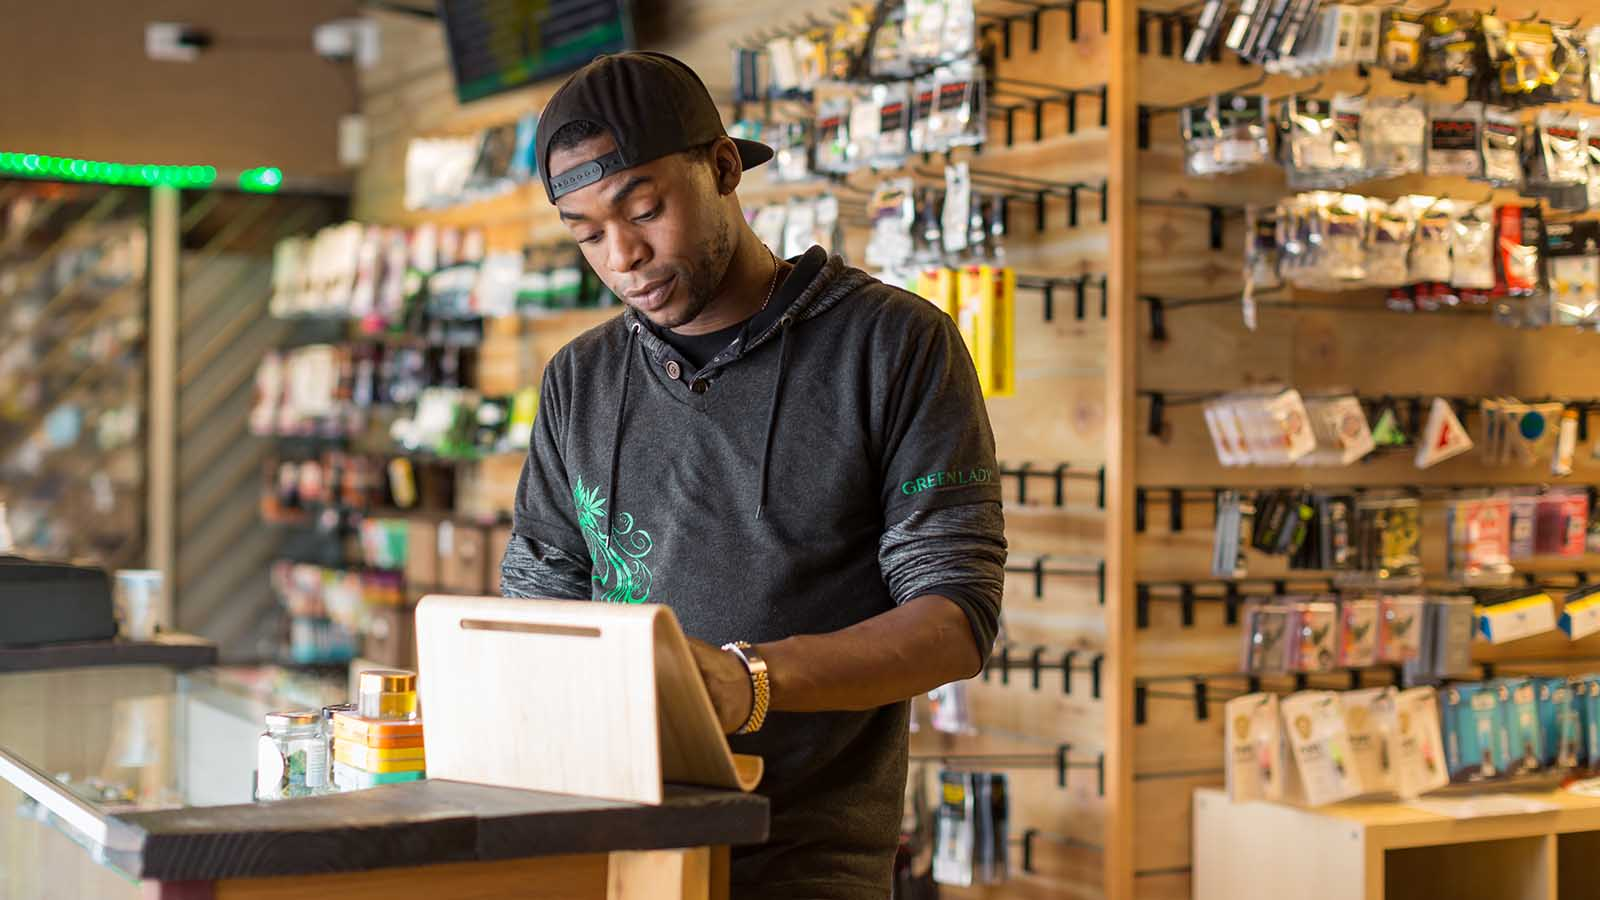 Dispensary Manager Job Description: 5 Key Responsibilities